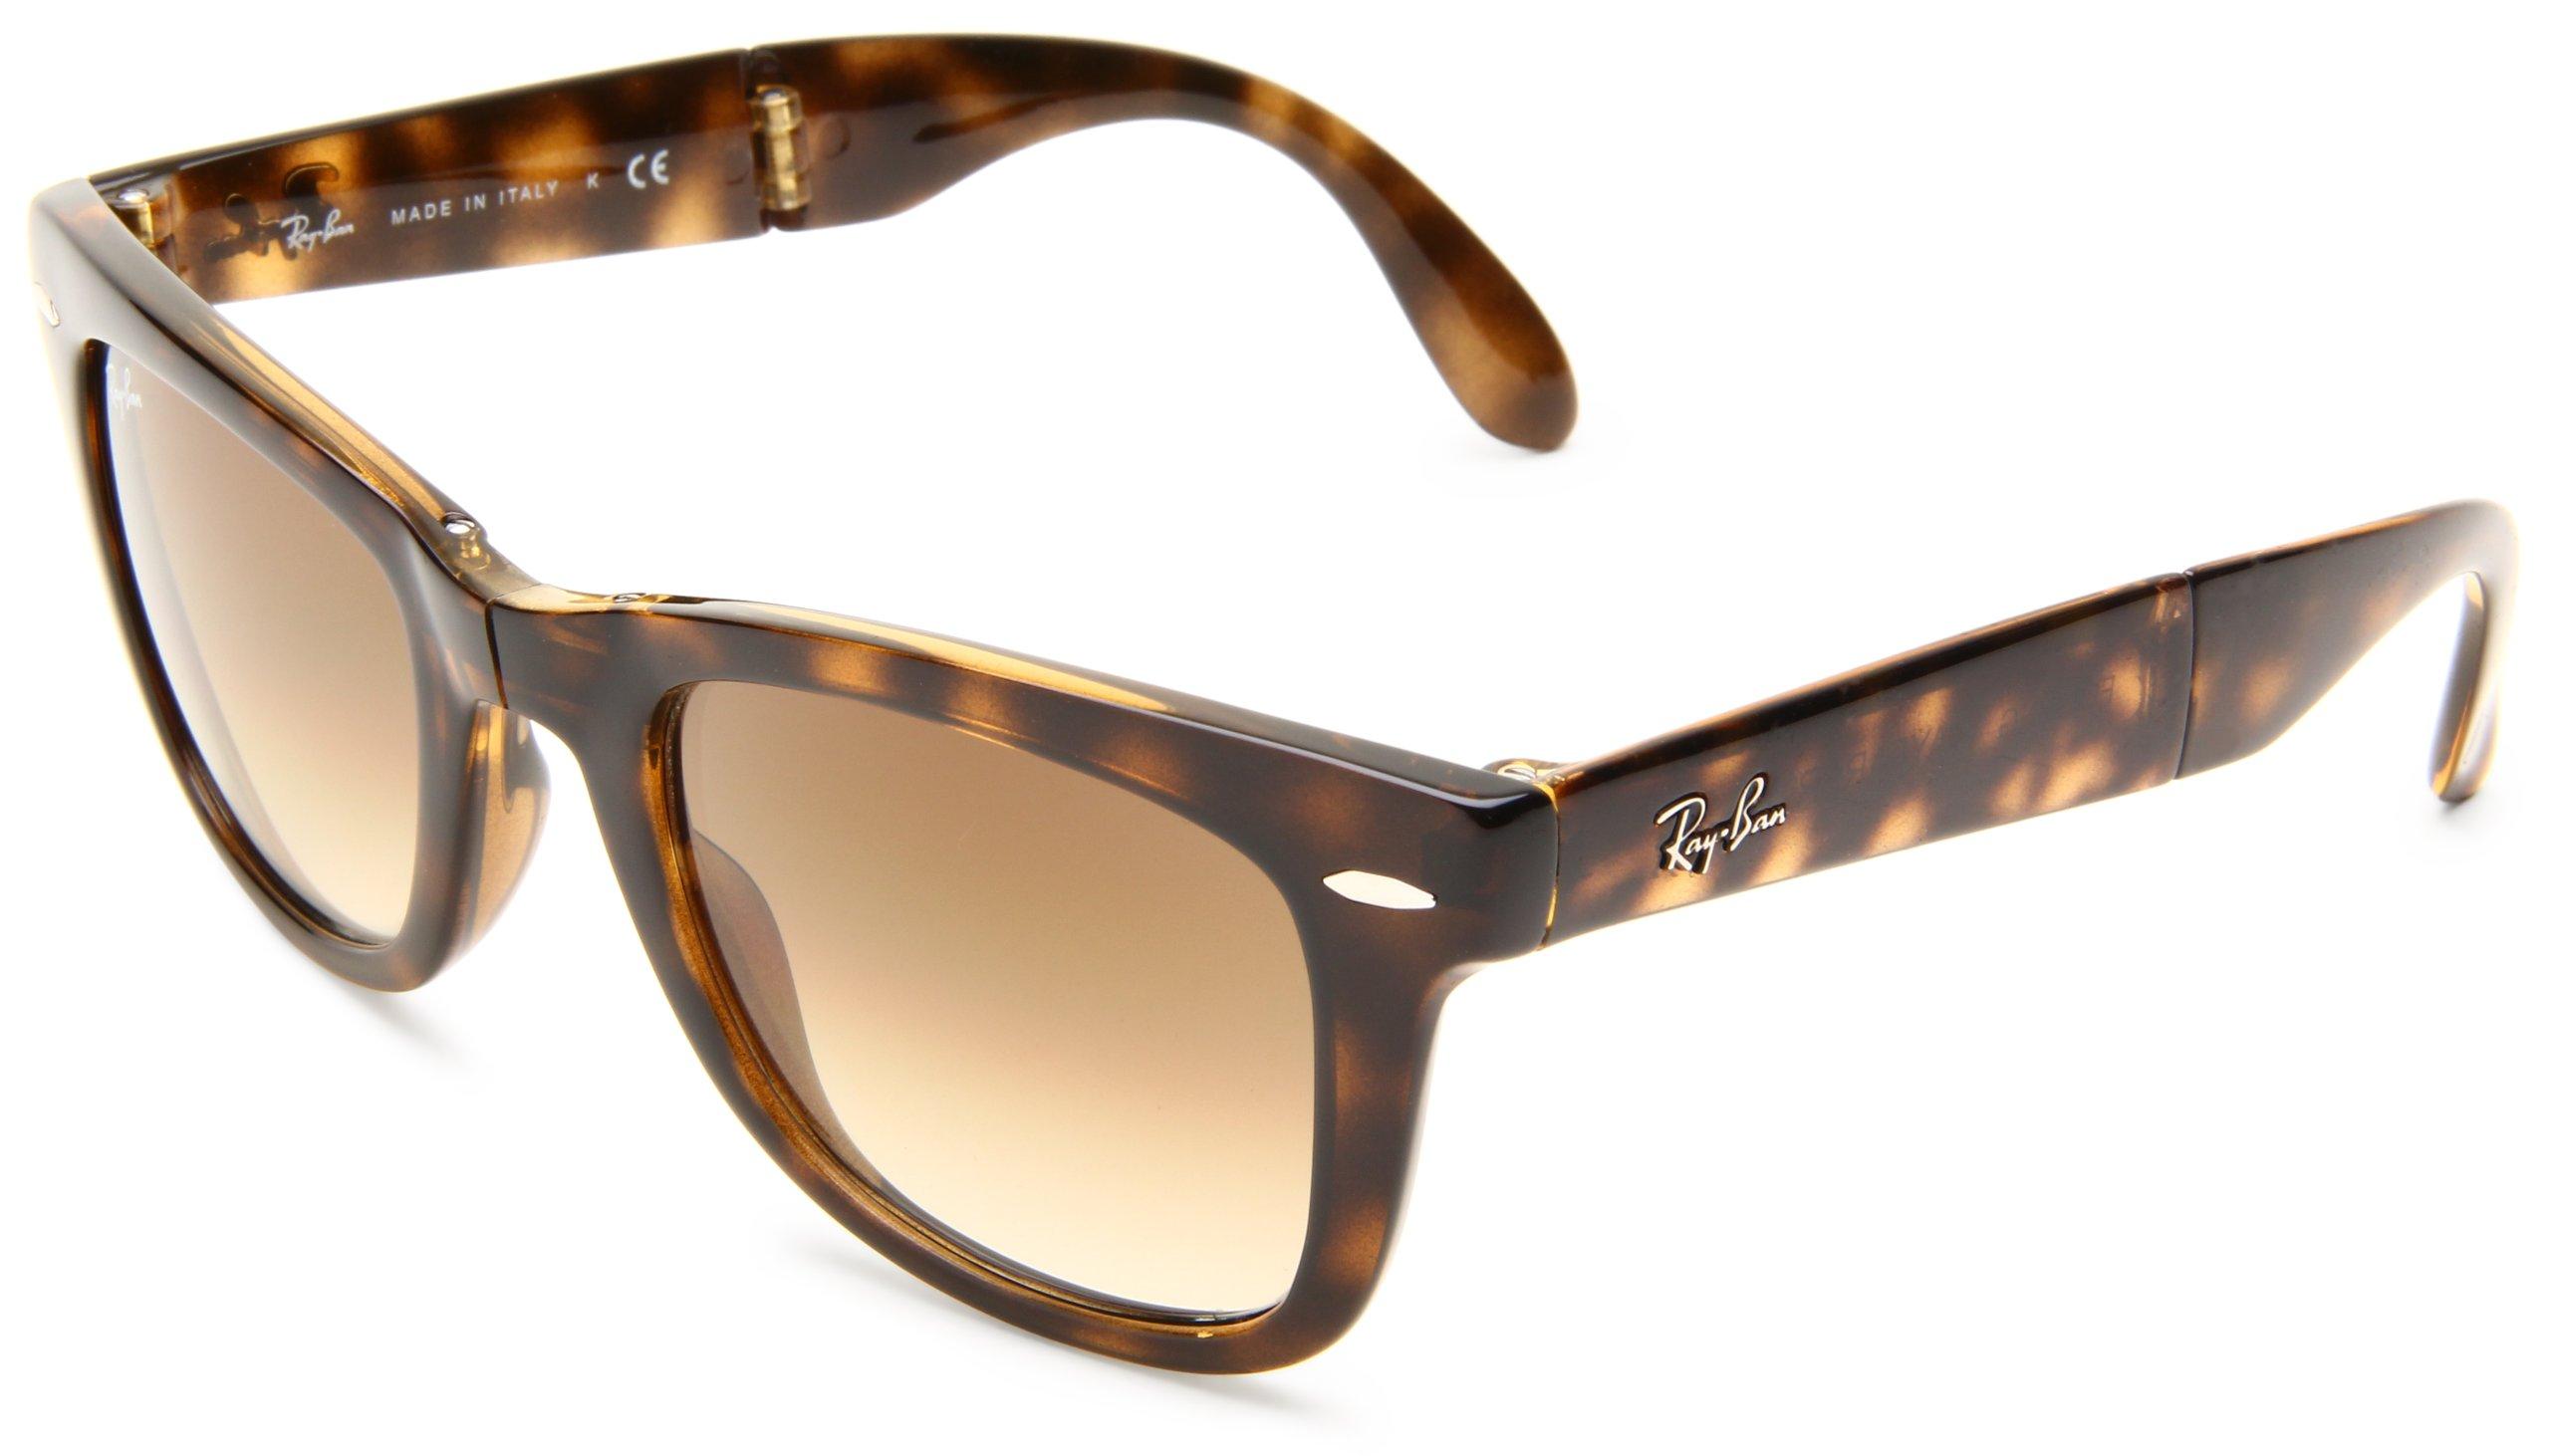 ray ban unisex rb4105 folding wayfarer  ray ban rb4105 wayfarer folding non polarized sunglasses 50mm